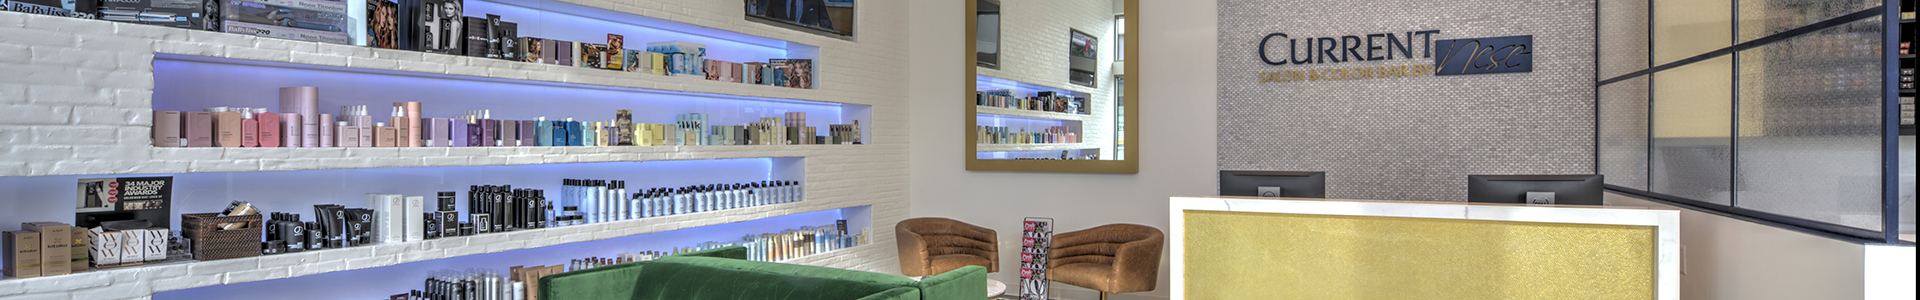 About Current Salon Color Bar Hair Salon In One Loudoun Virginia